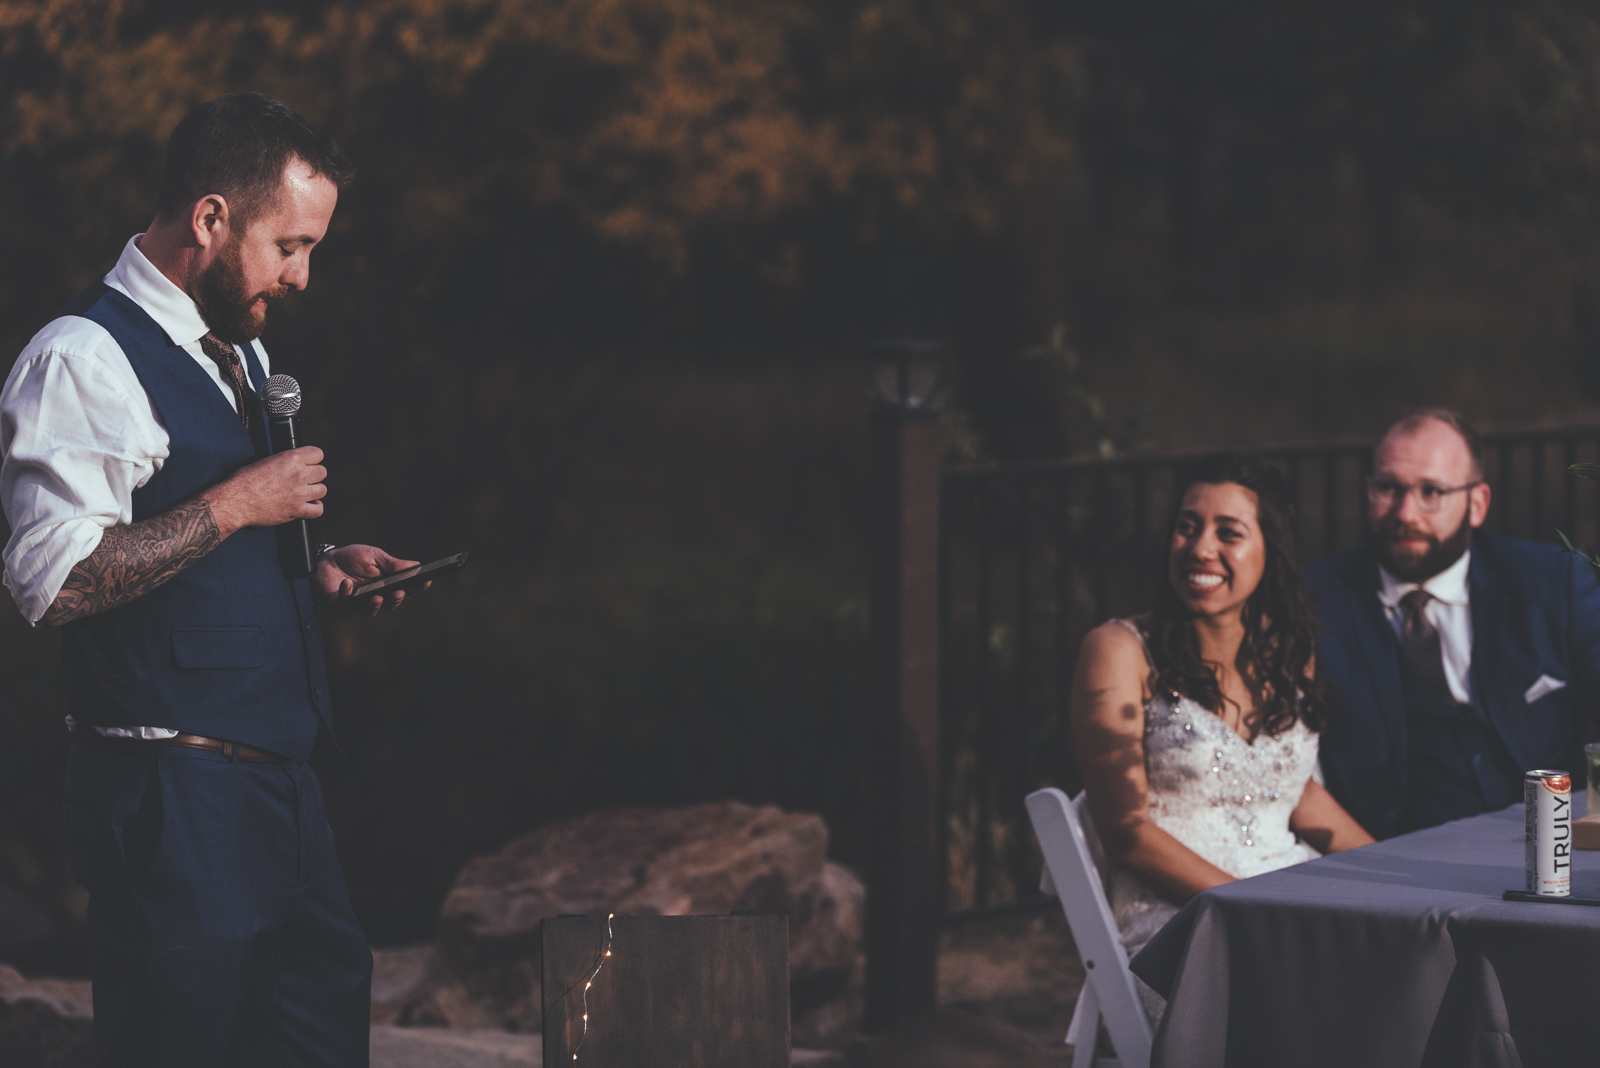 ChadFahnestockPhotography-estes-park-wedding-photography-051.jpg